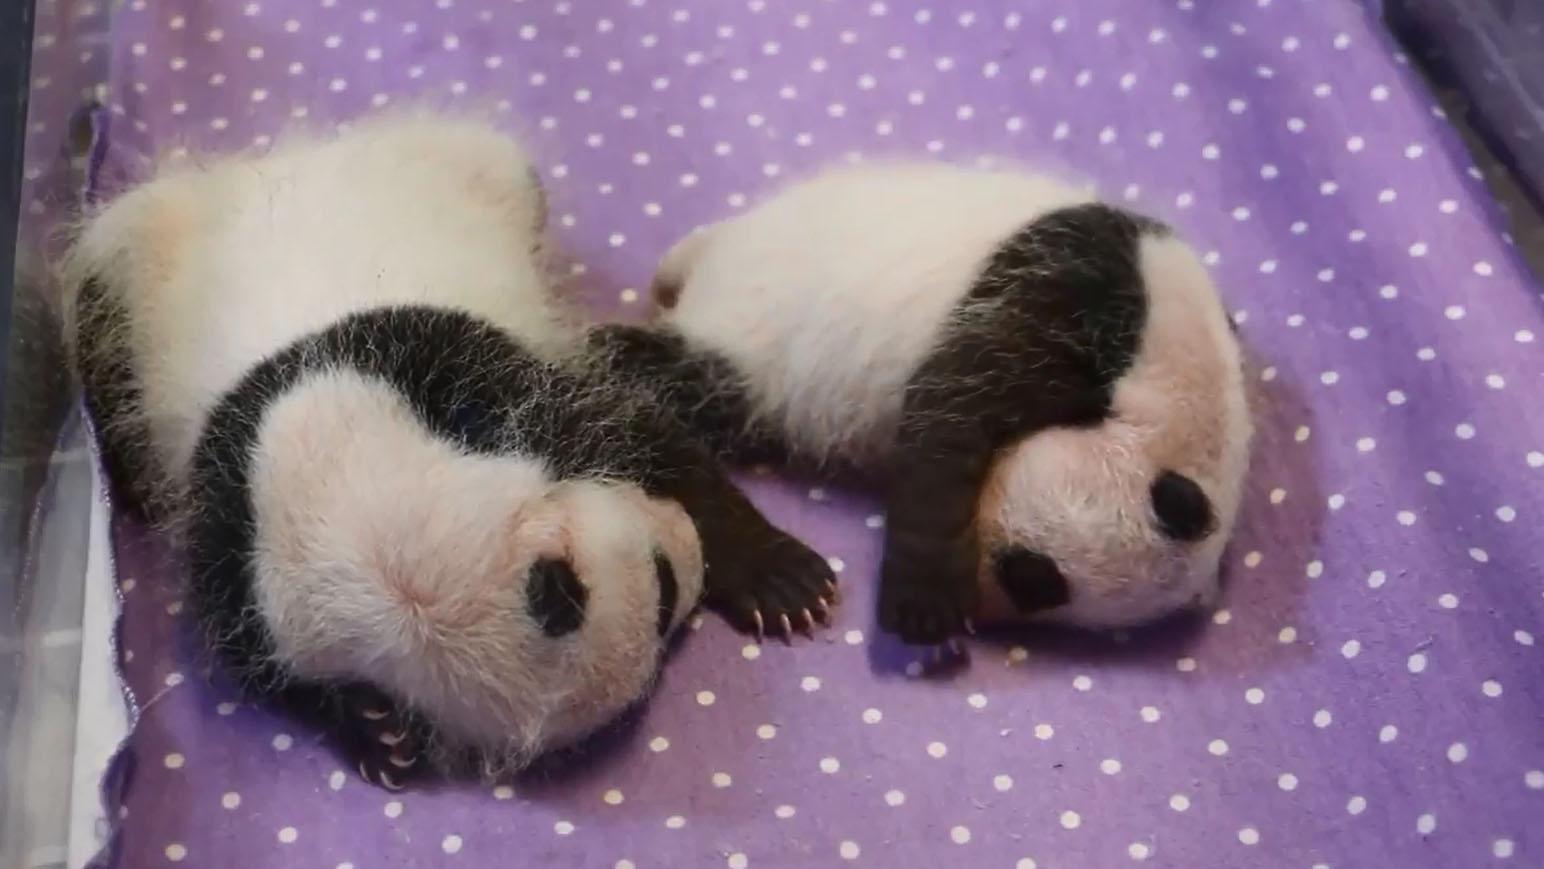 The Toronto Zoo's twin pandas are seen on Nov. 12, 2015. Screen grab via Twitter/@TheTorontoZoo.